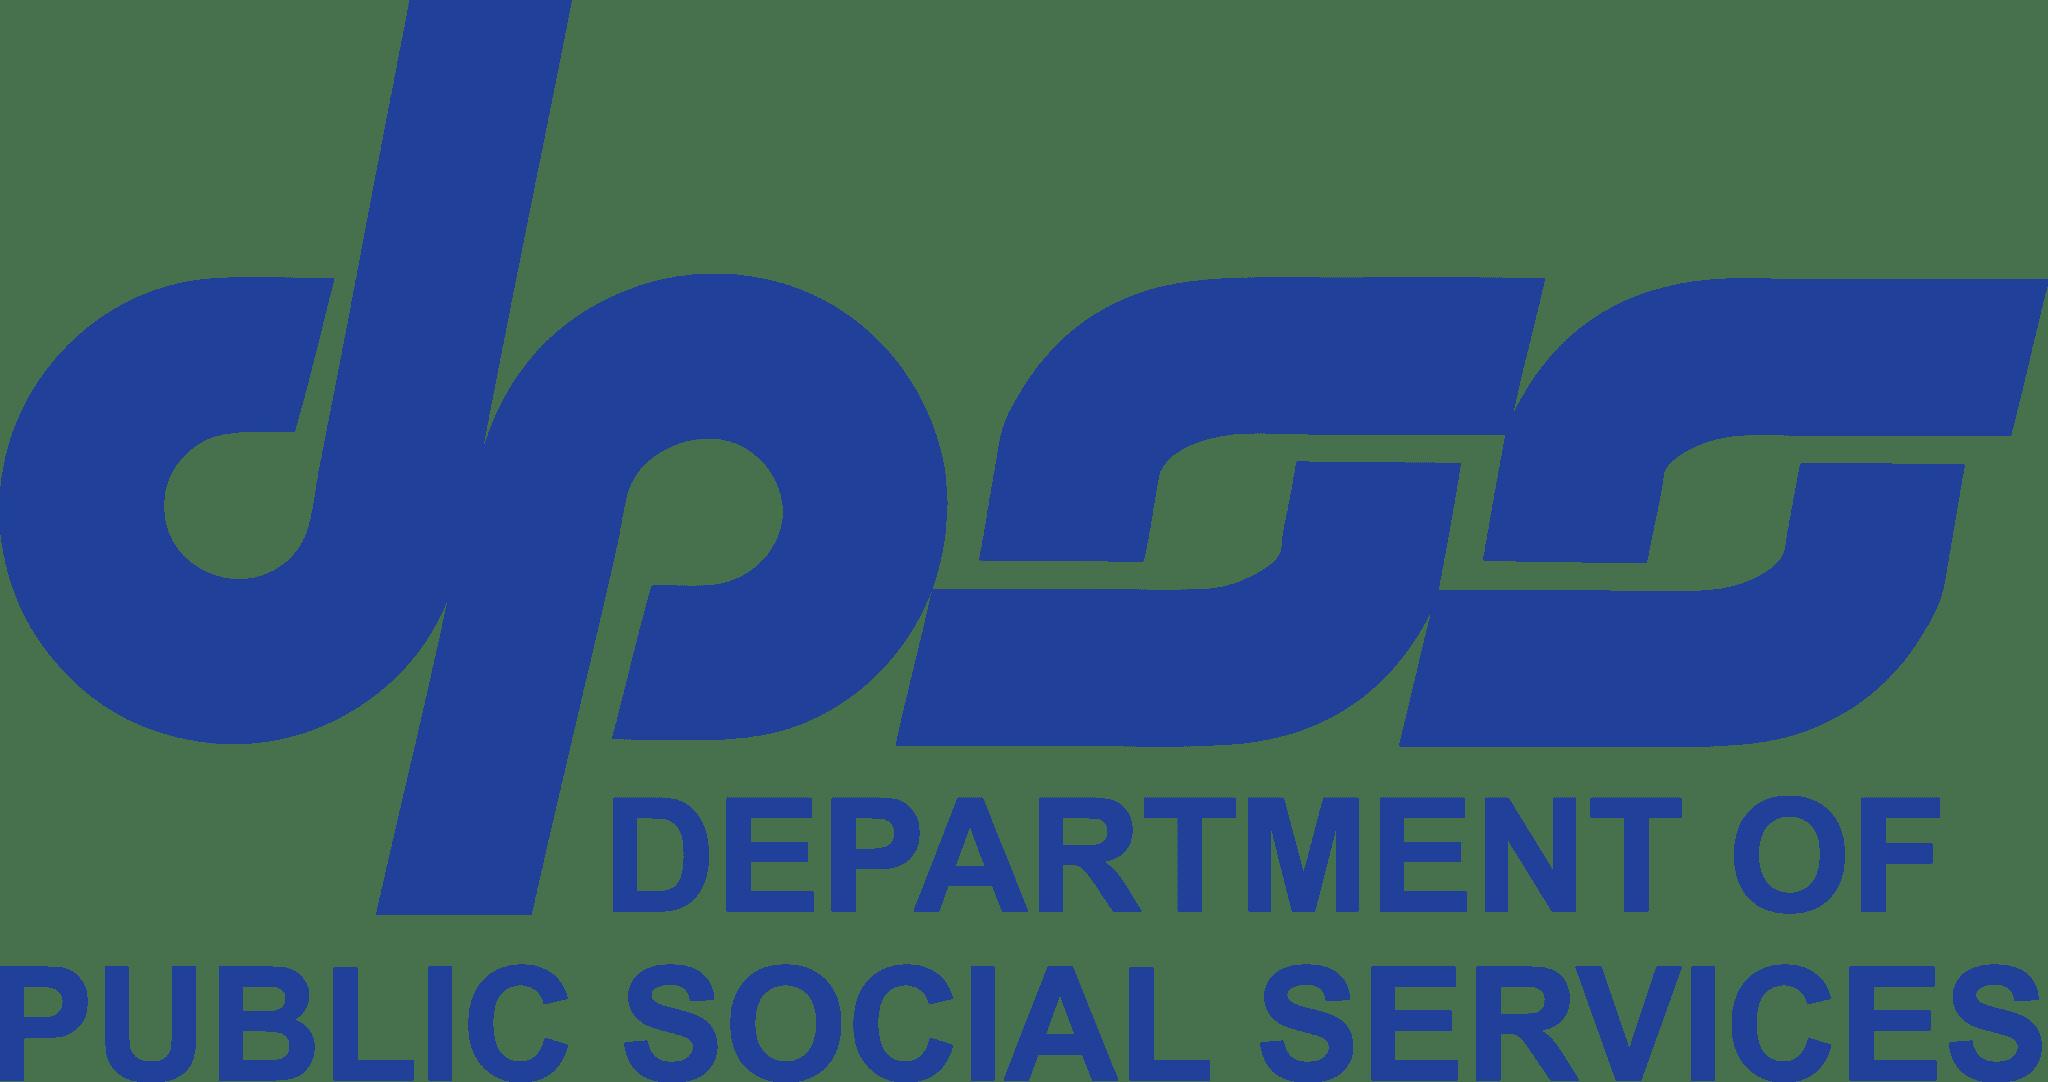 LA County Department of Public Social Services (LA DPSS)